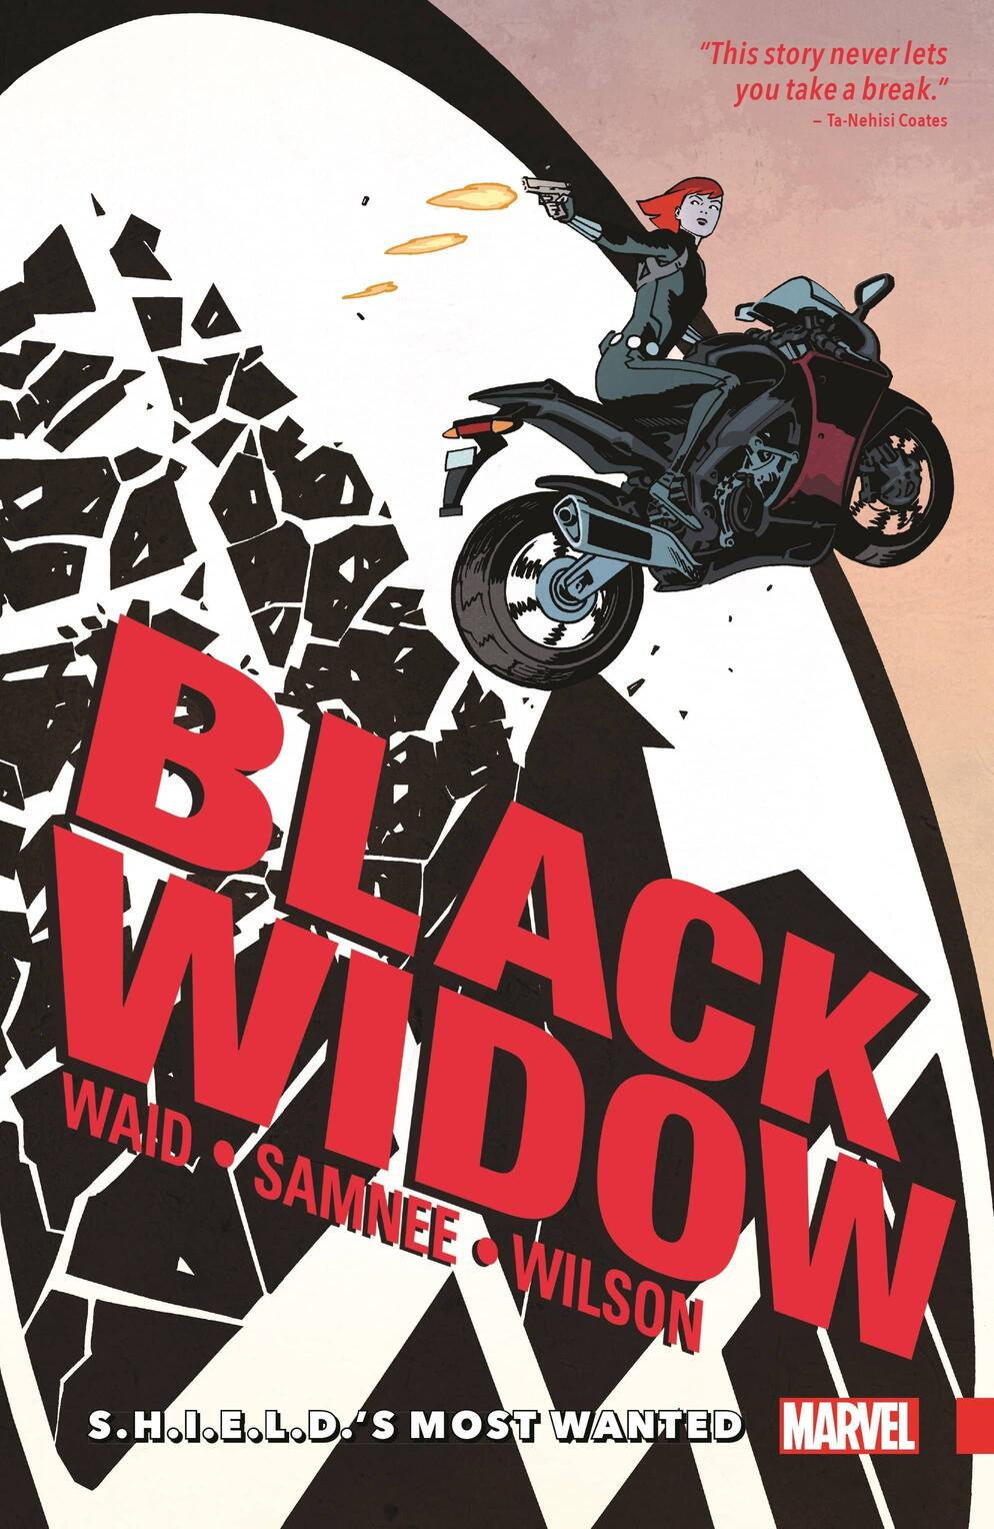 Cover to BLACK WIDOW VOL. 1: S.H.I.E.L.D.'S MOST WANTED.